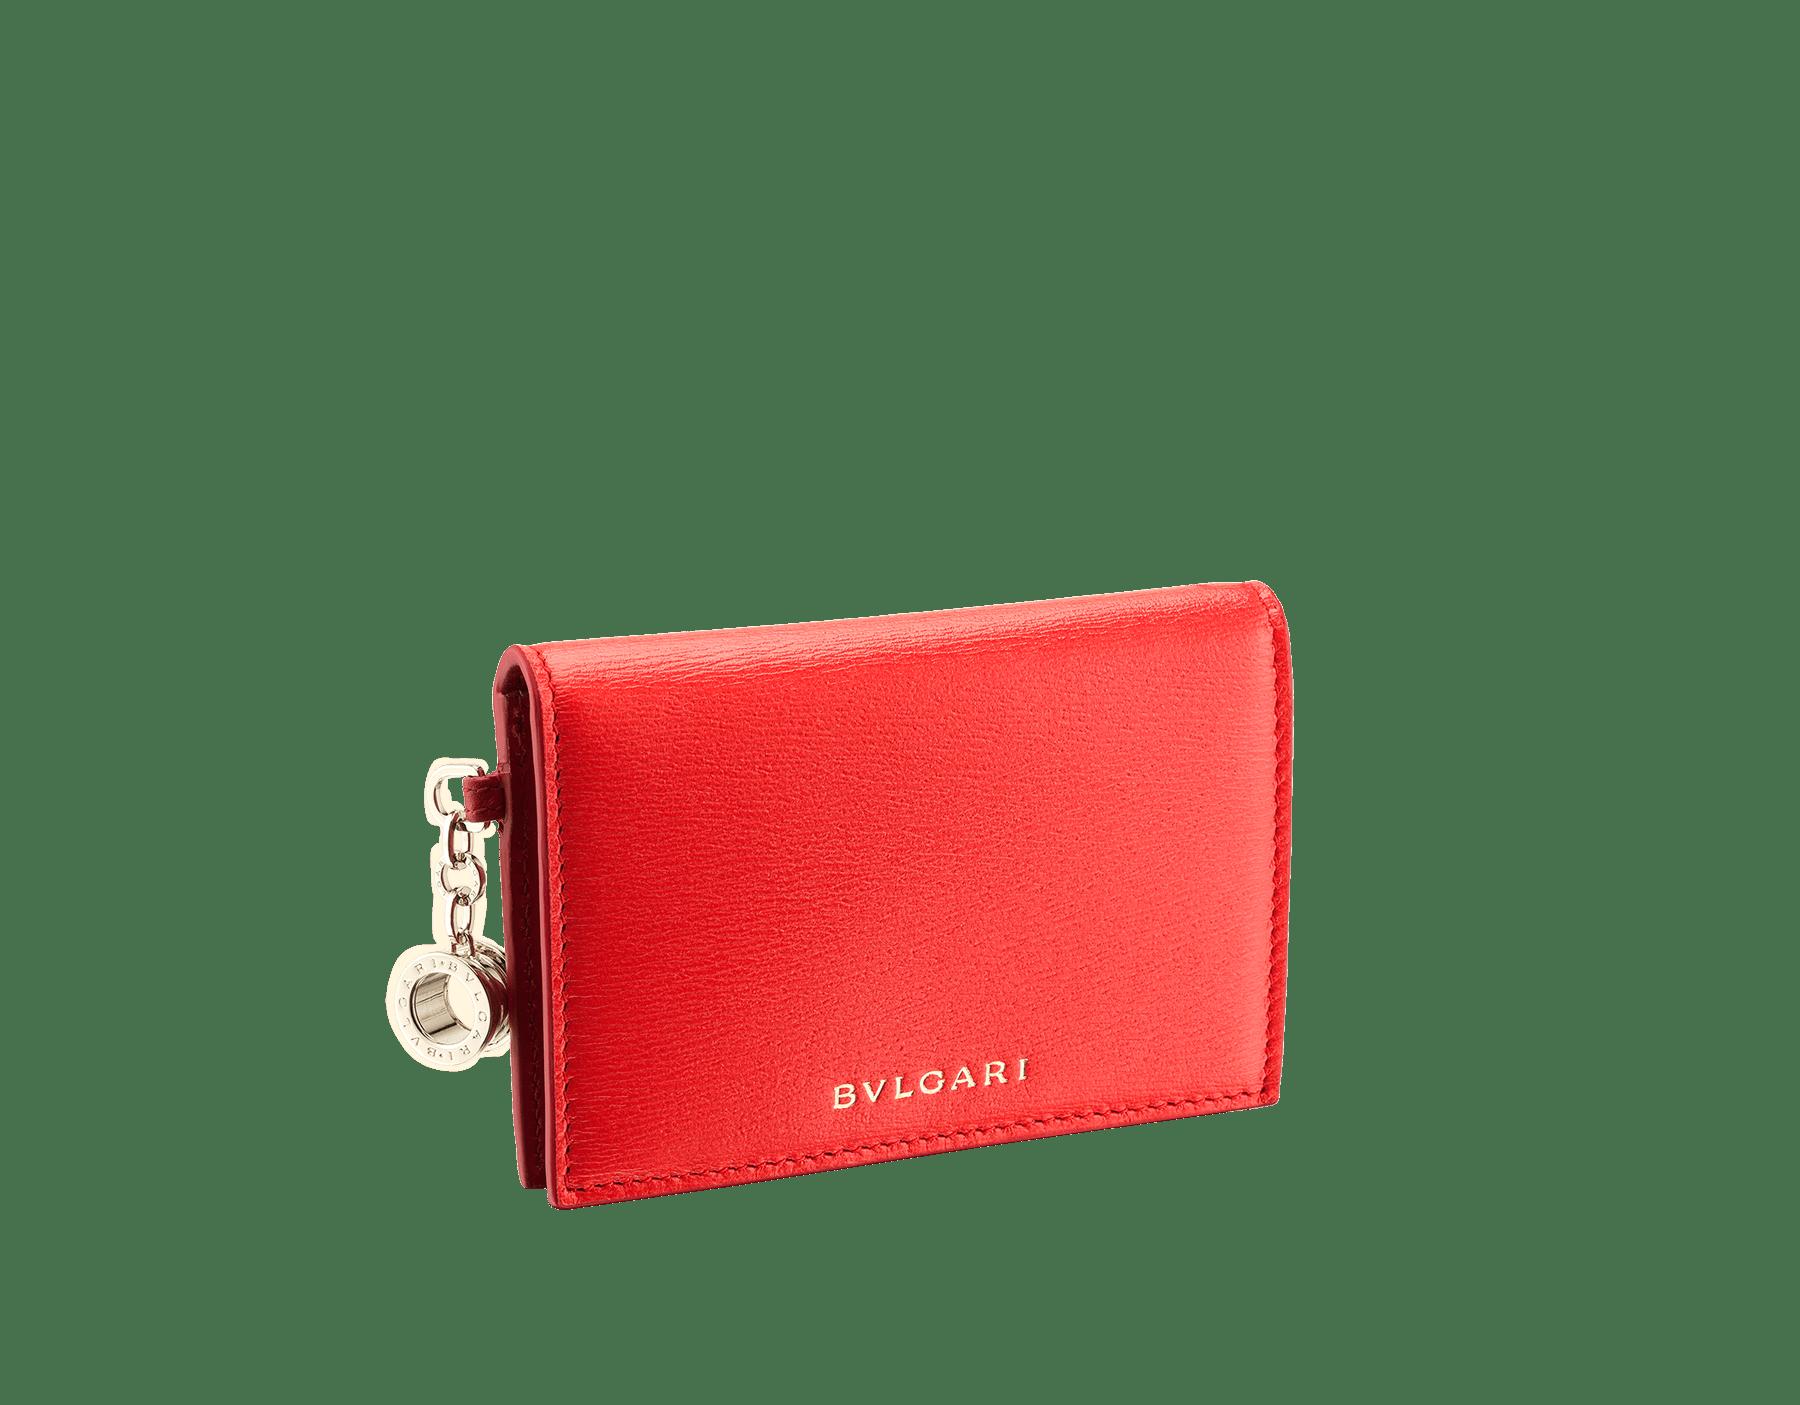 B.zero1 open credit card holder in sea star coral and carmine jasper goatskin. Iconic B.zero1 charm in light gold-plated brass. 288237 image 1